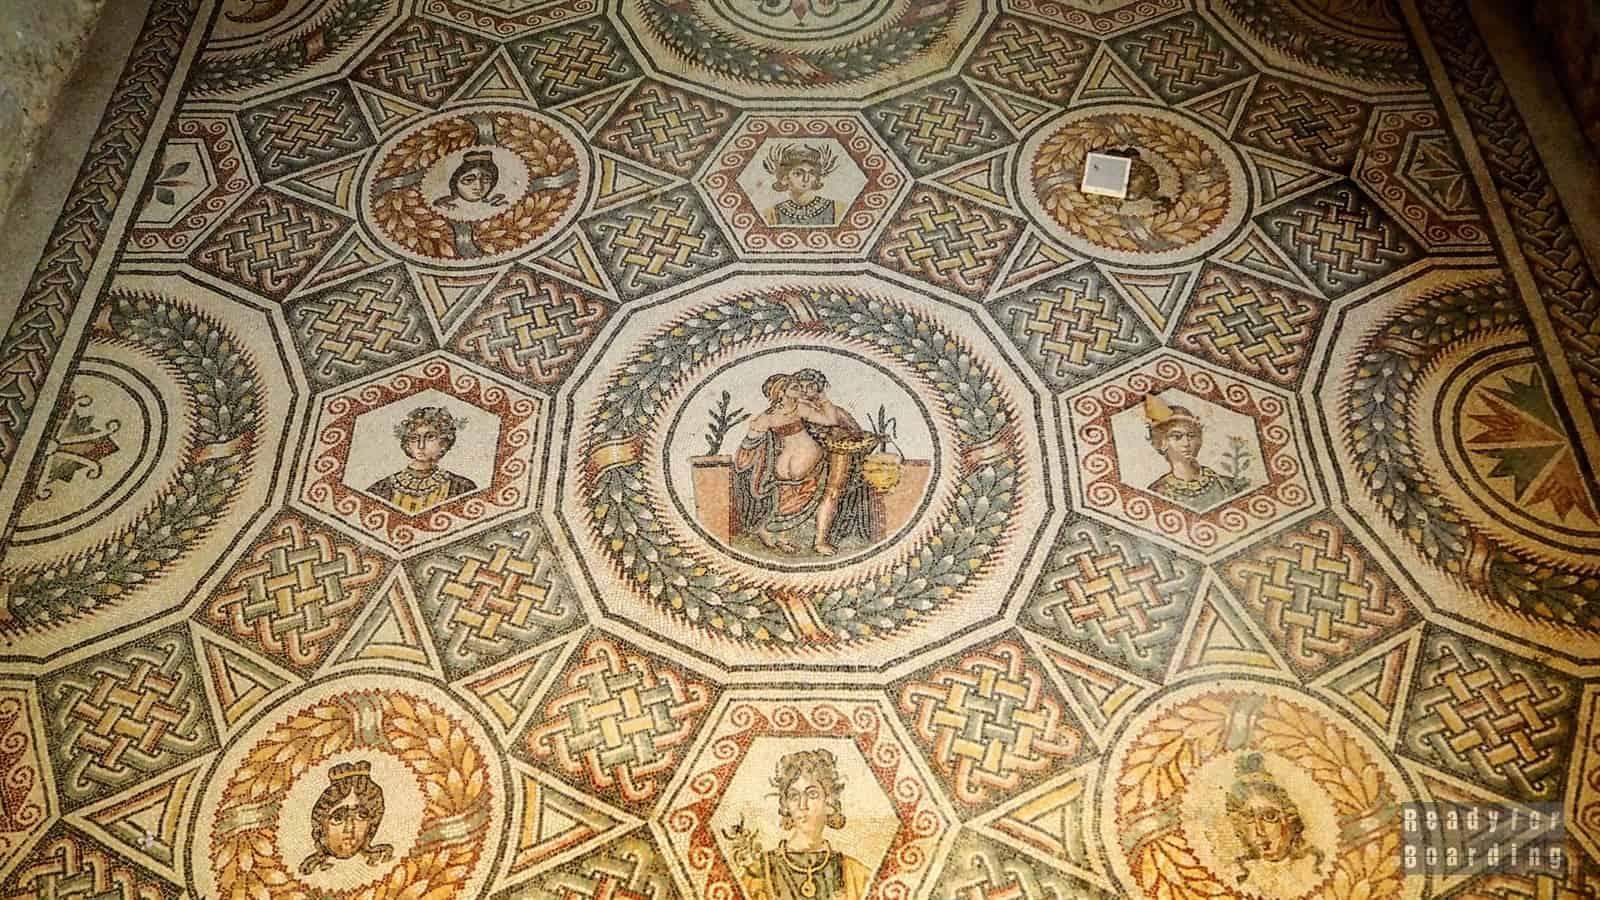 Sycylia - Villa Romana i Enna (galeria zdjęć)